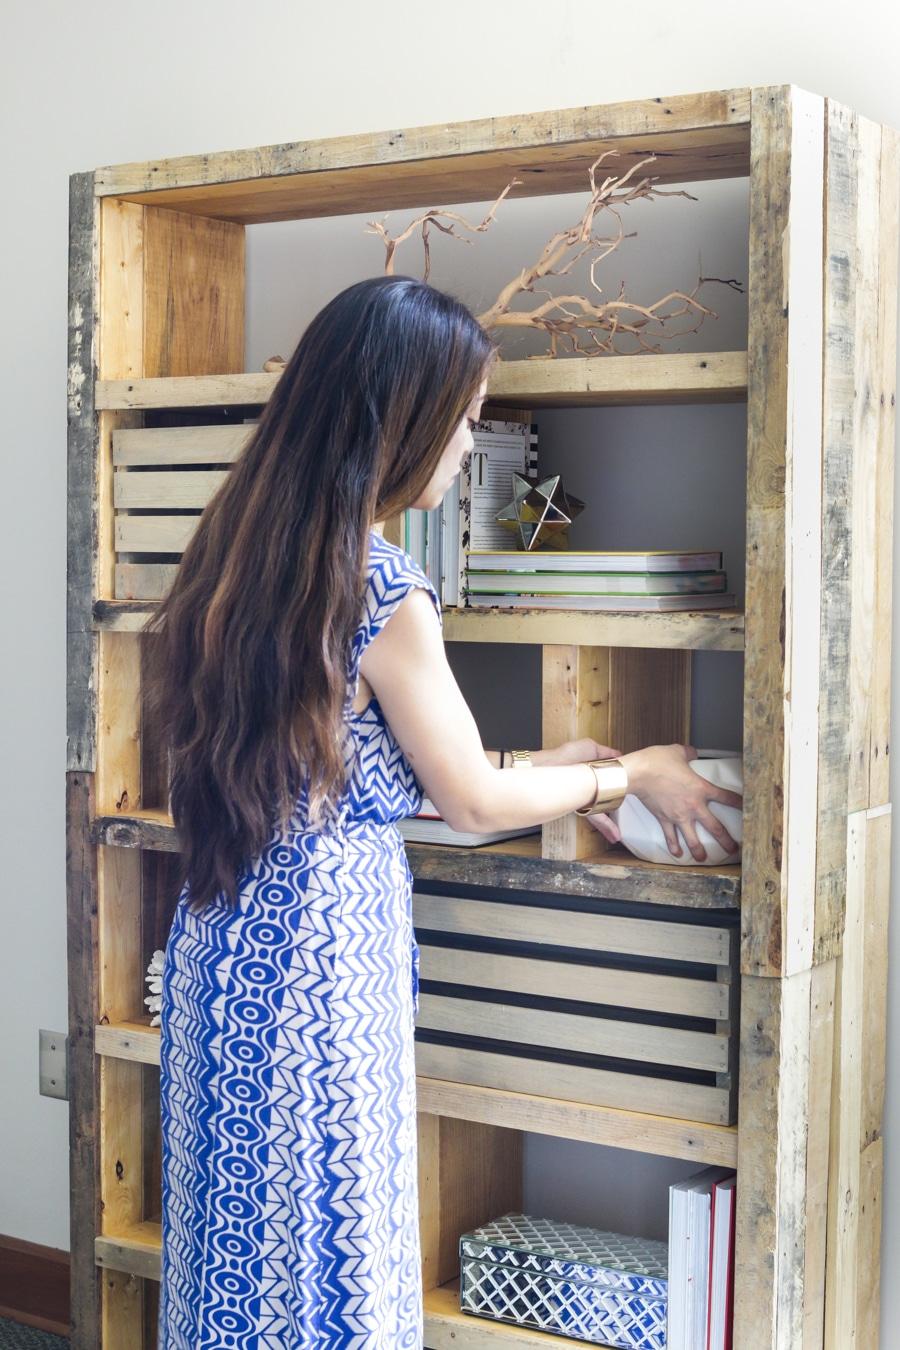 DIY Crates and Pallet Bookshelf